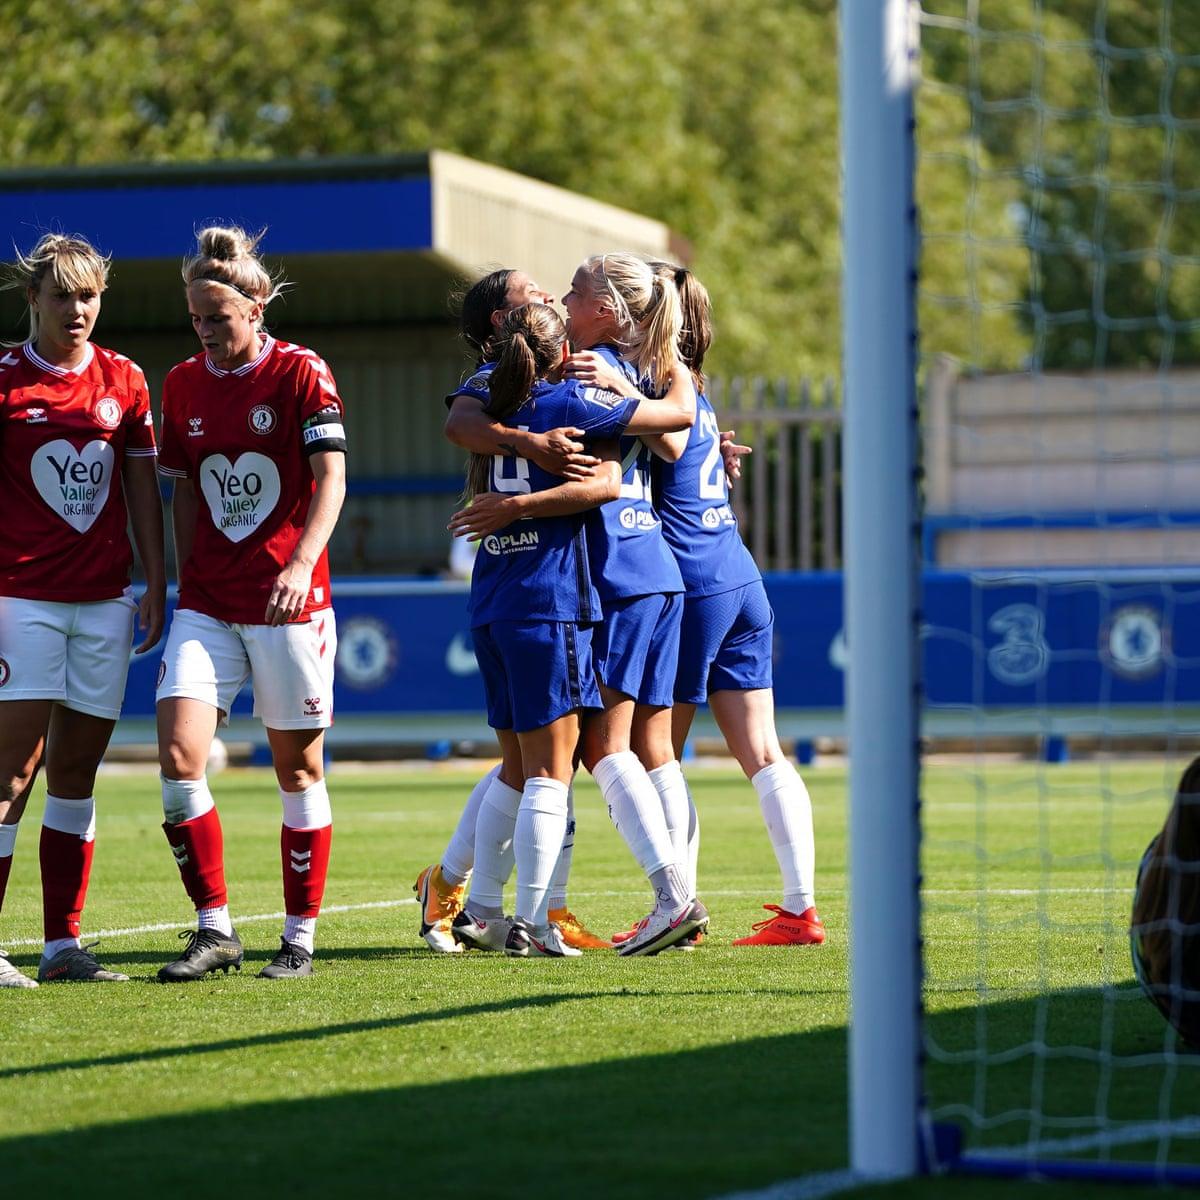 Chelsea 9 0 Bristol City Women S Super League As It Happened Football The Guardian